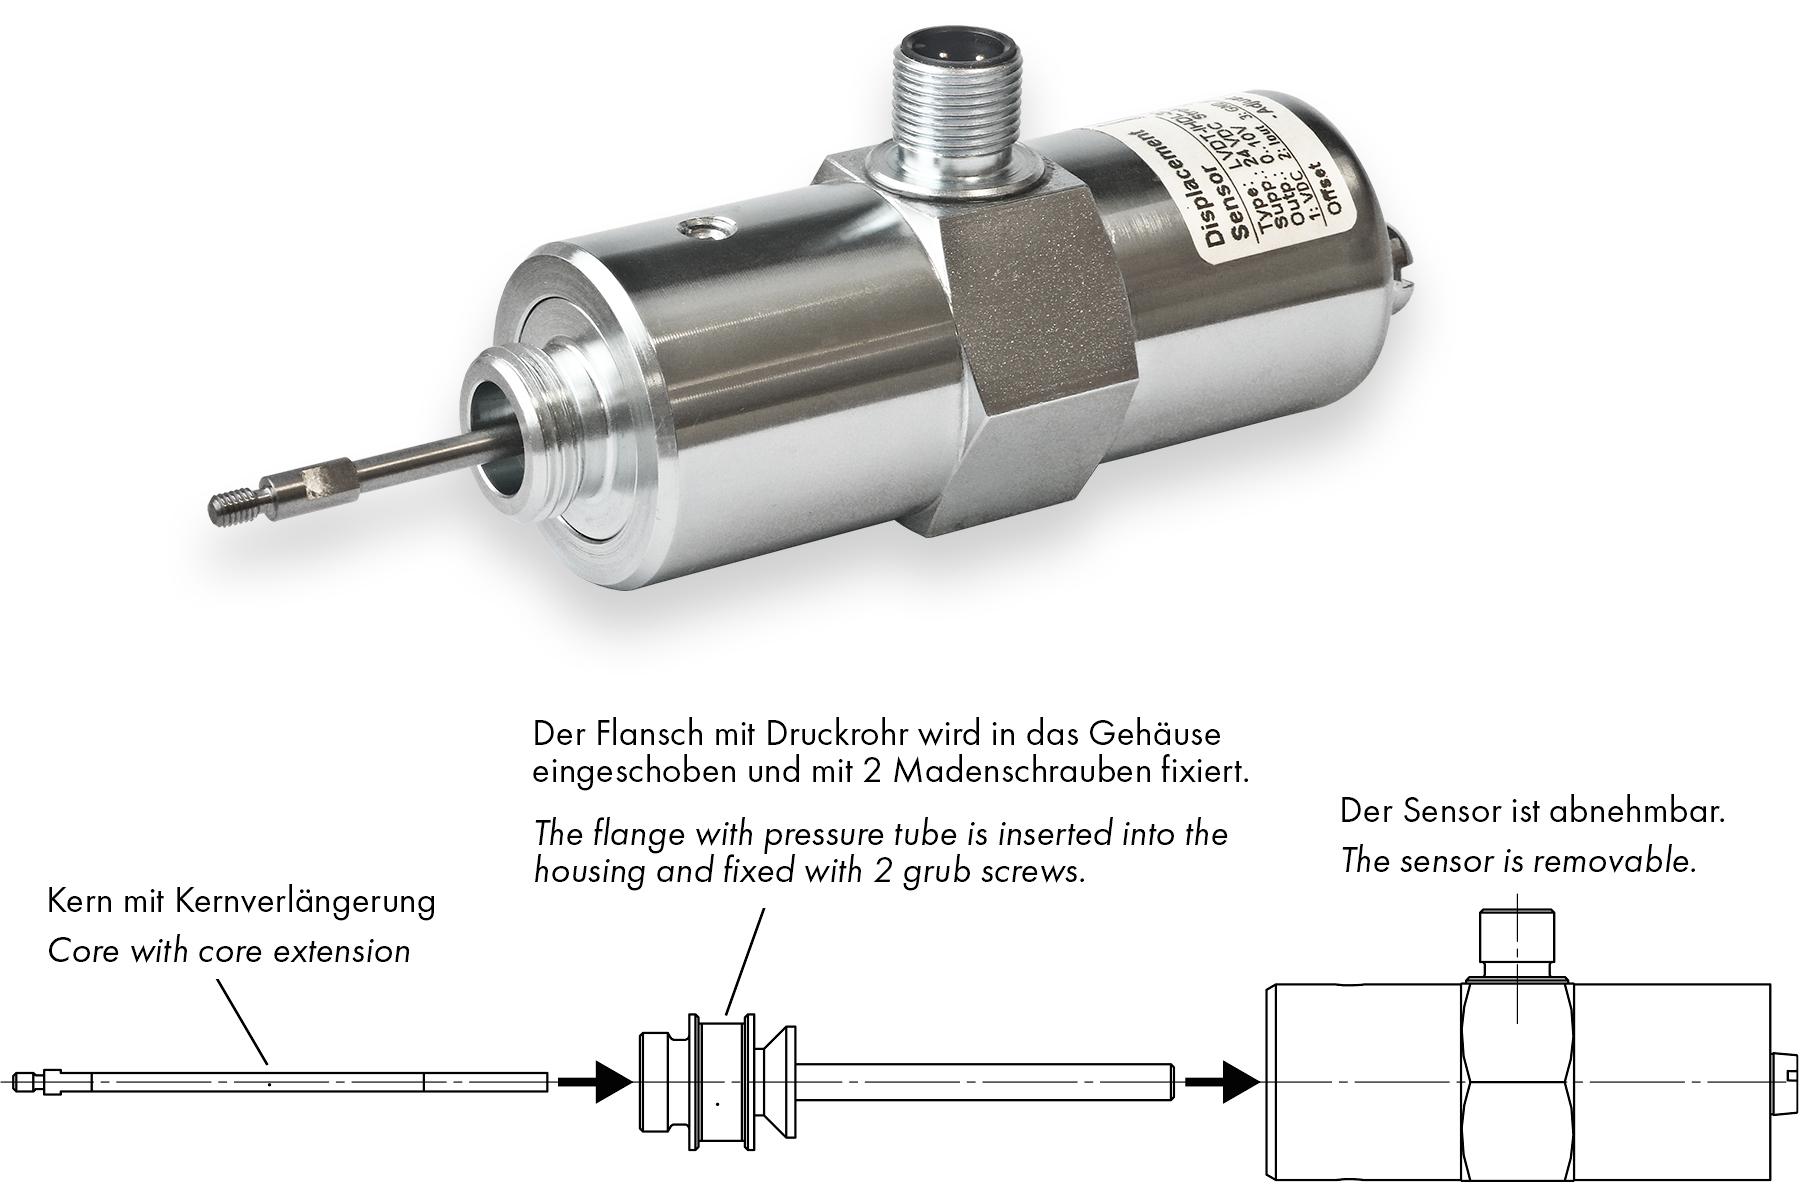 LVDT-Ventilsensoren mit modularem Aufbau